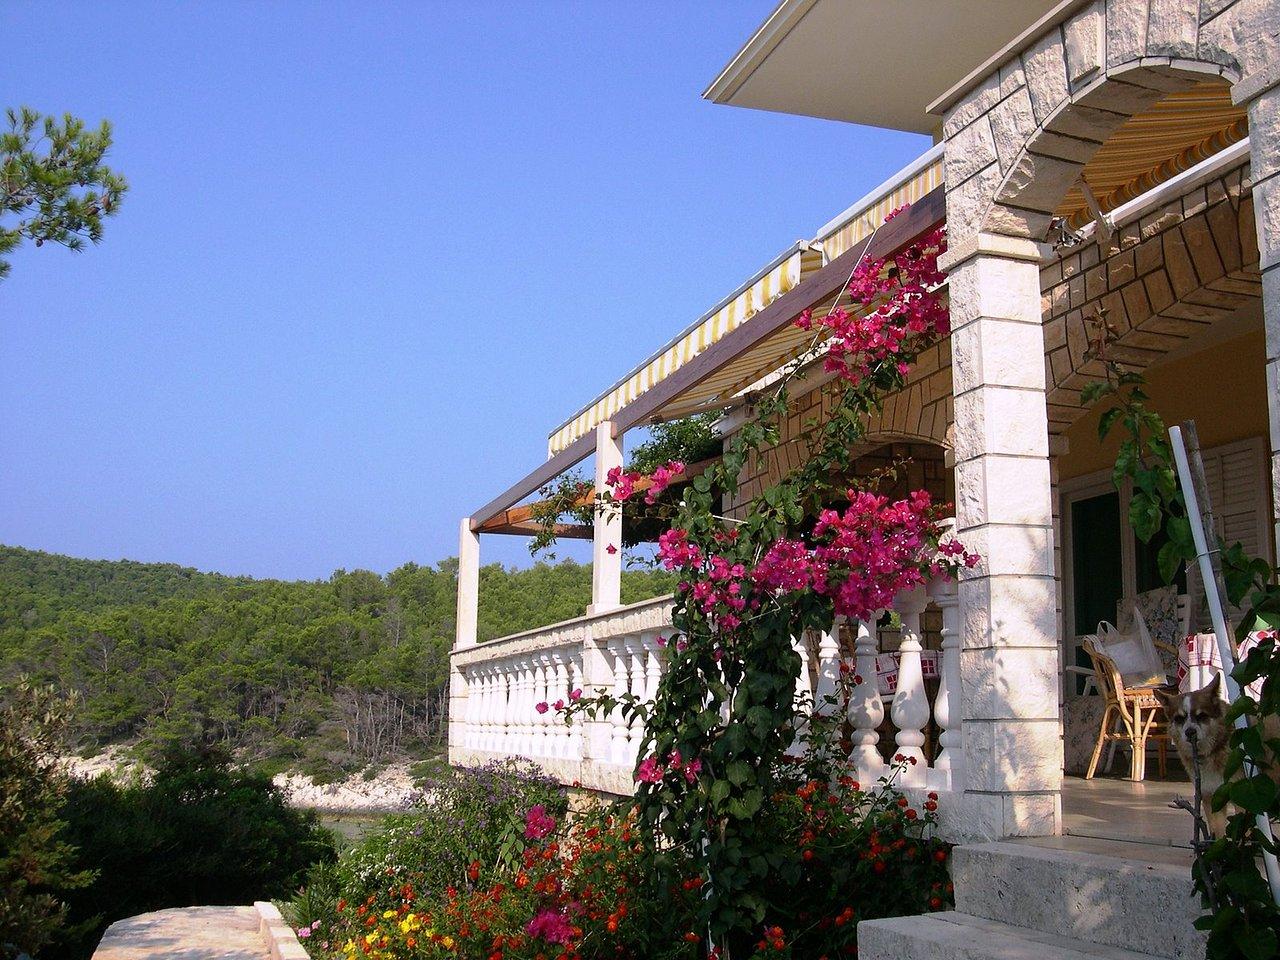 Flower garden under the front terrace